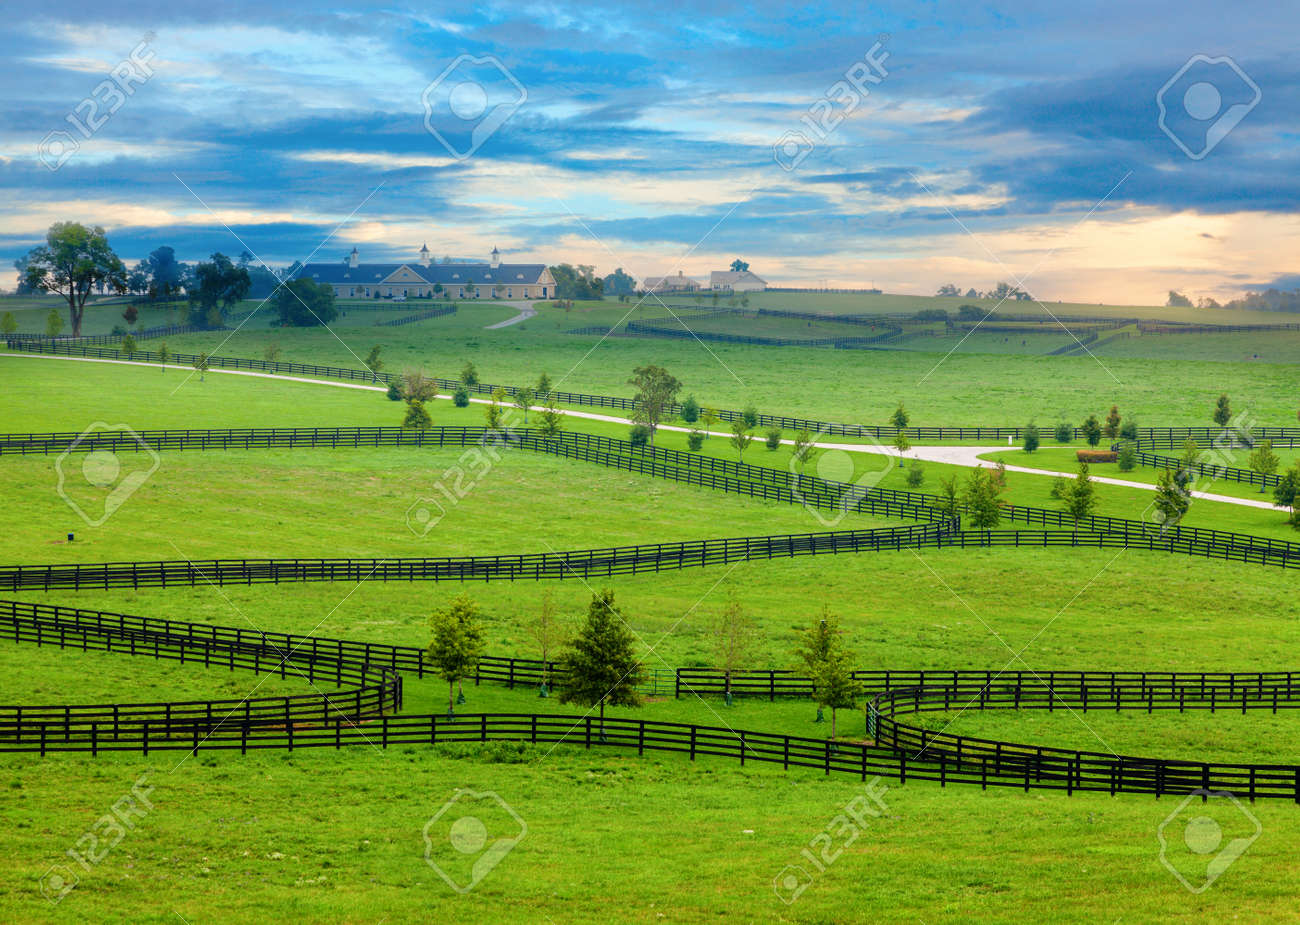 Horse farm in Kentucky Stock Photo - 18221821